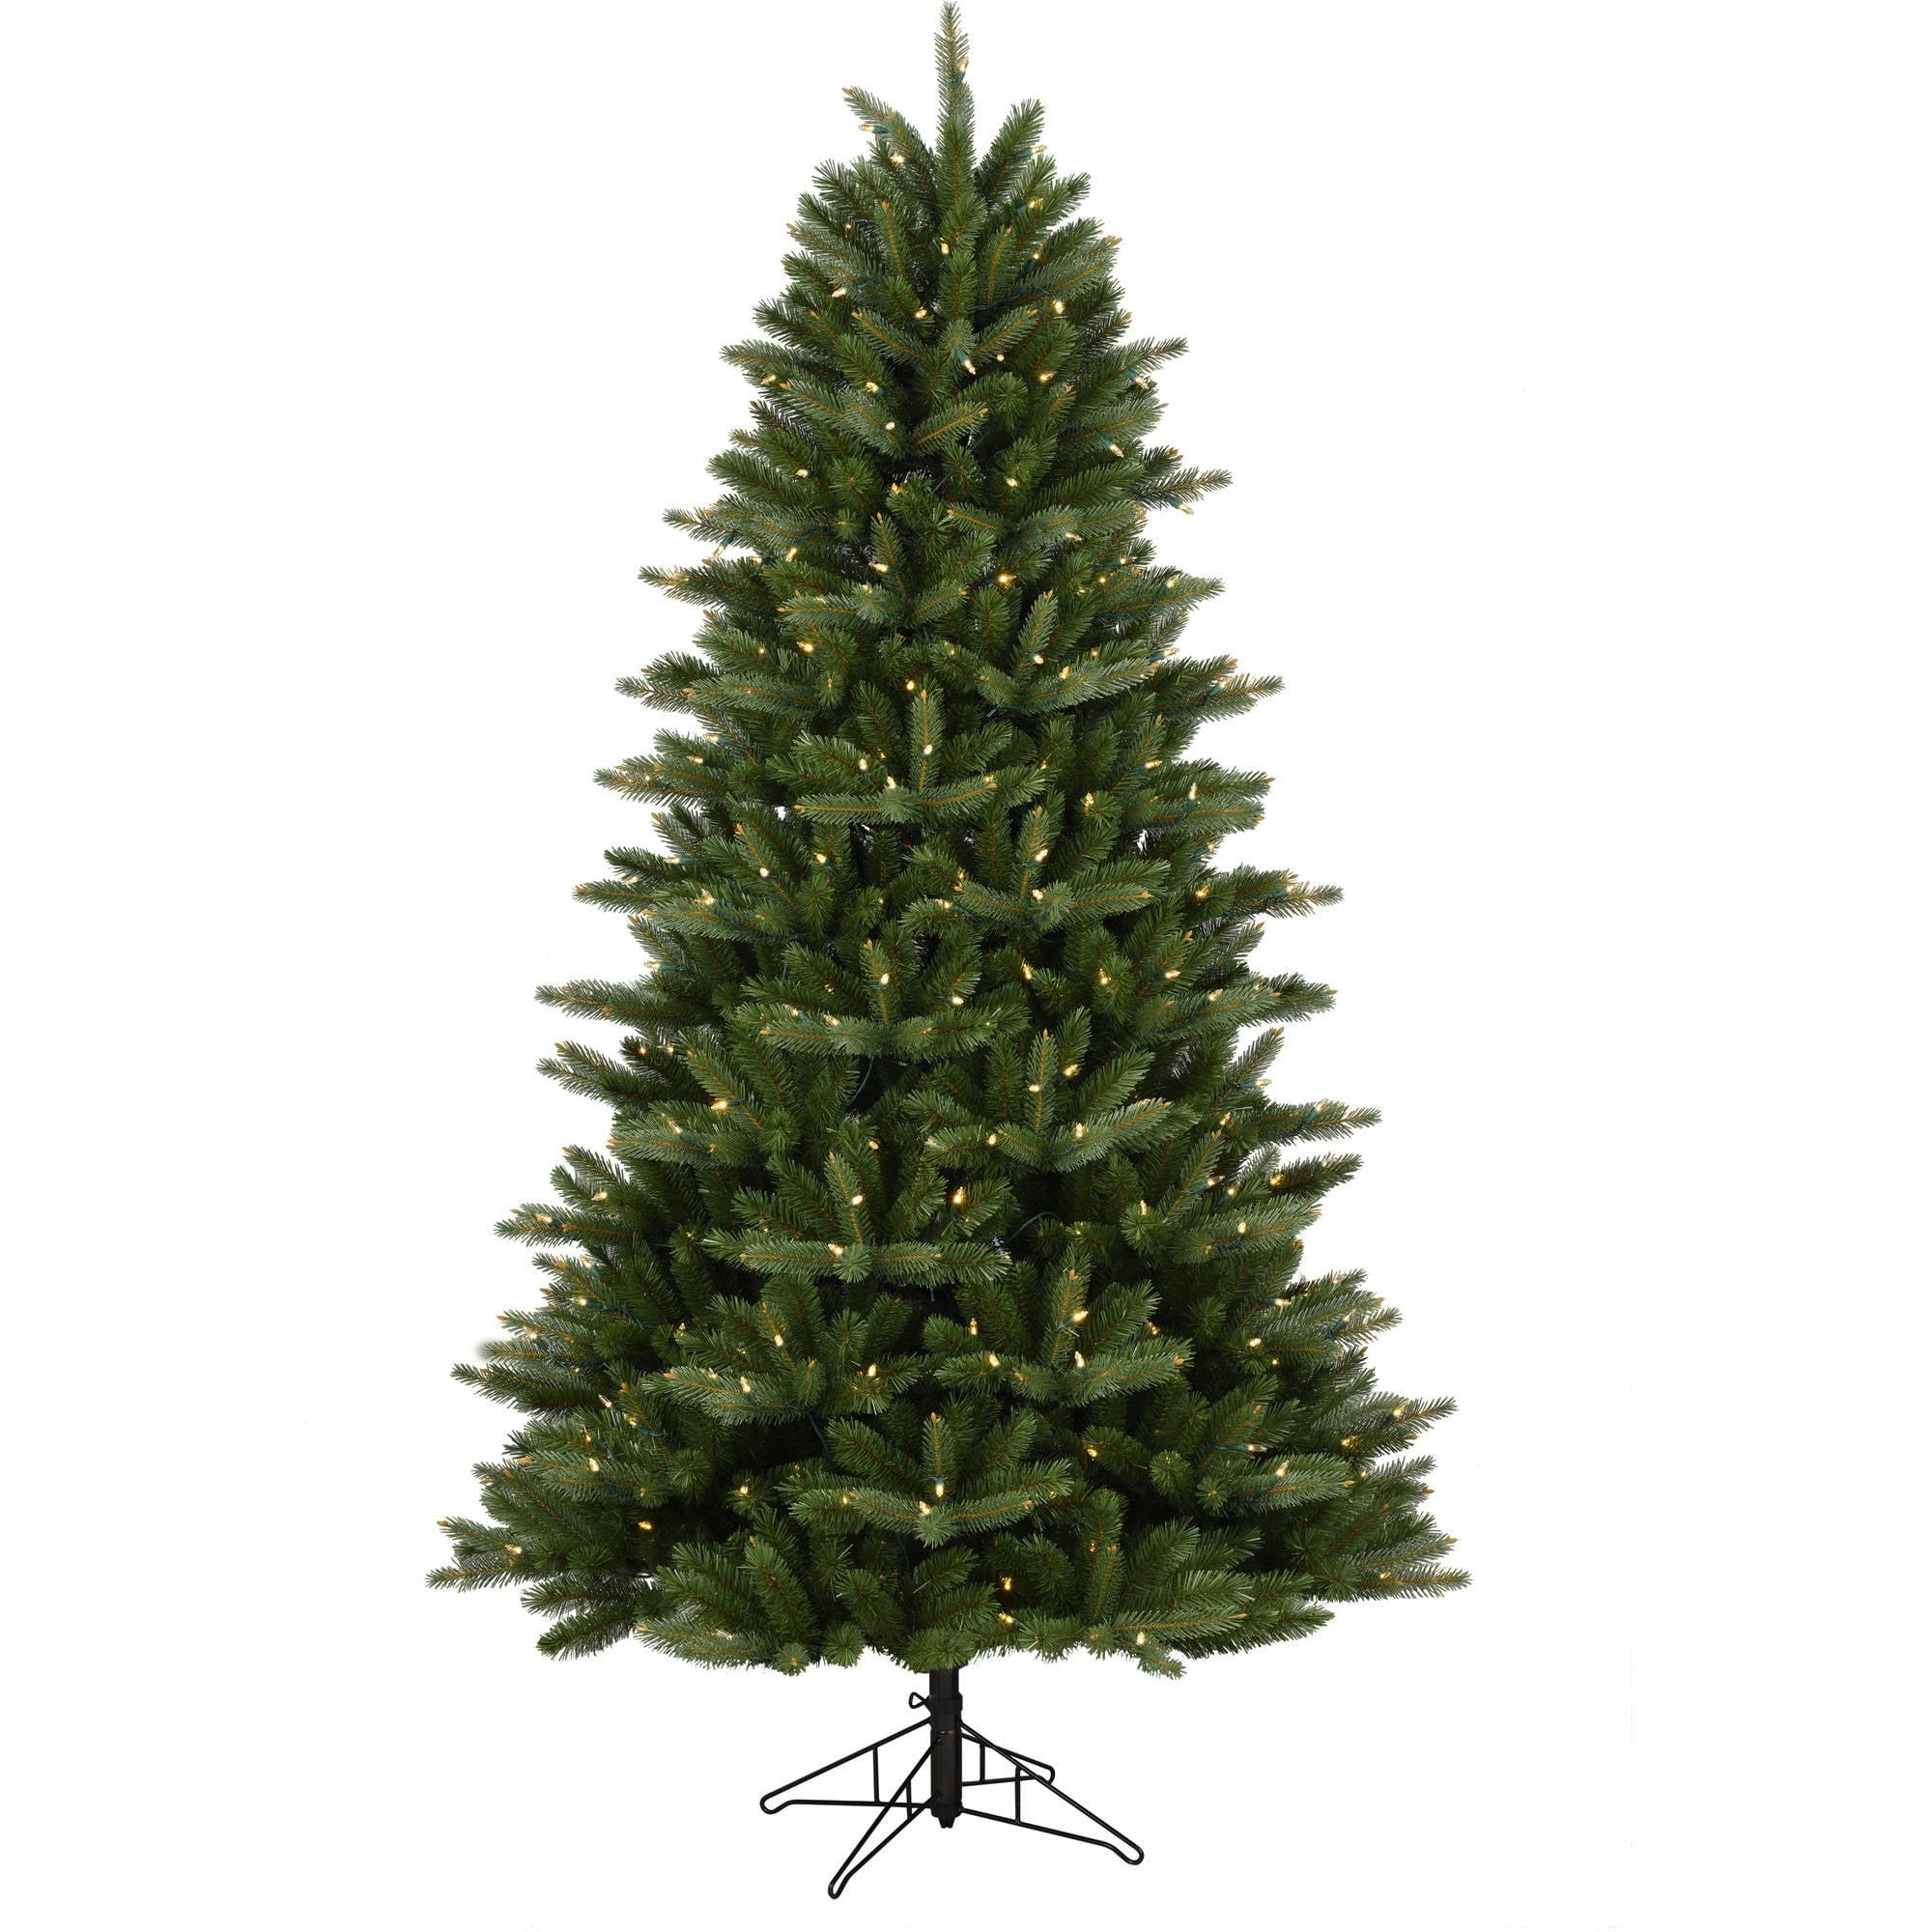 GE Pre-Lit 7.5' Douglas Fir Artificial Christmas Tree, Dual Color ...